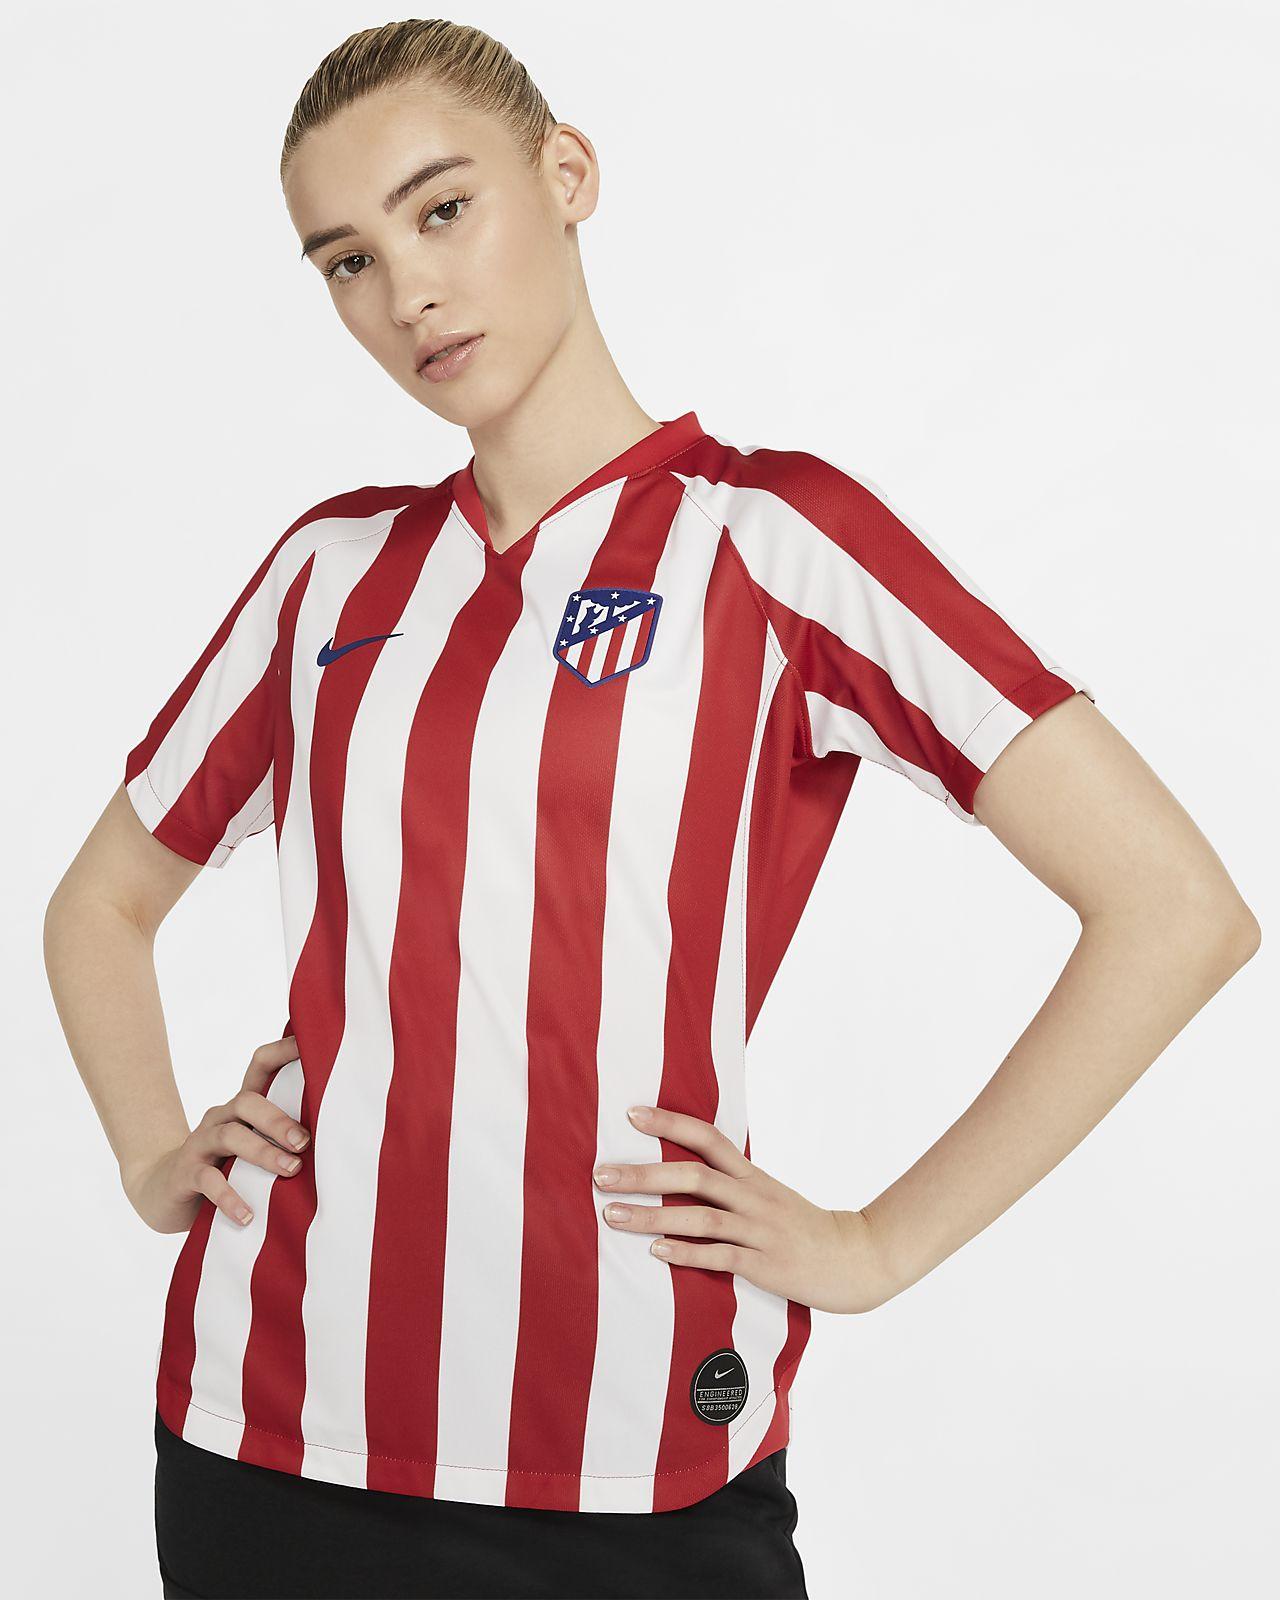 Atlético de Madrid 2019/20 Stadium Home Kadın Futbol Forması